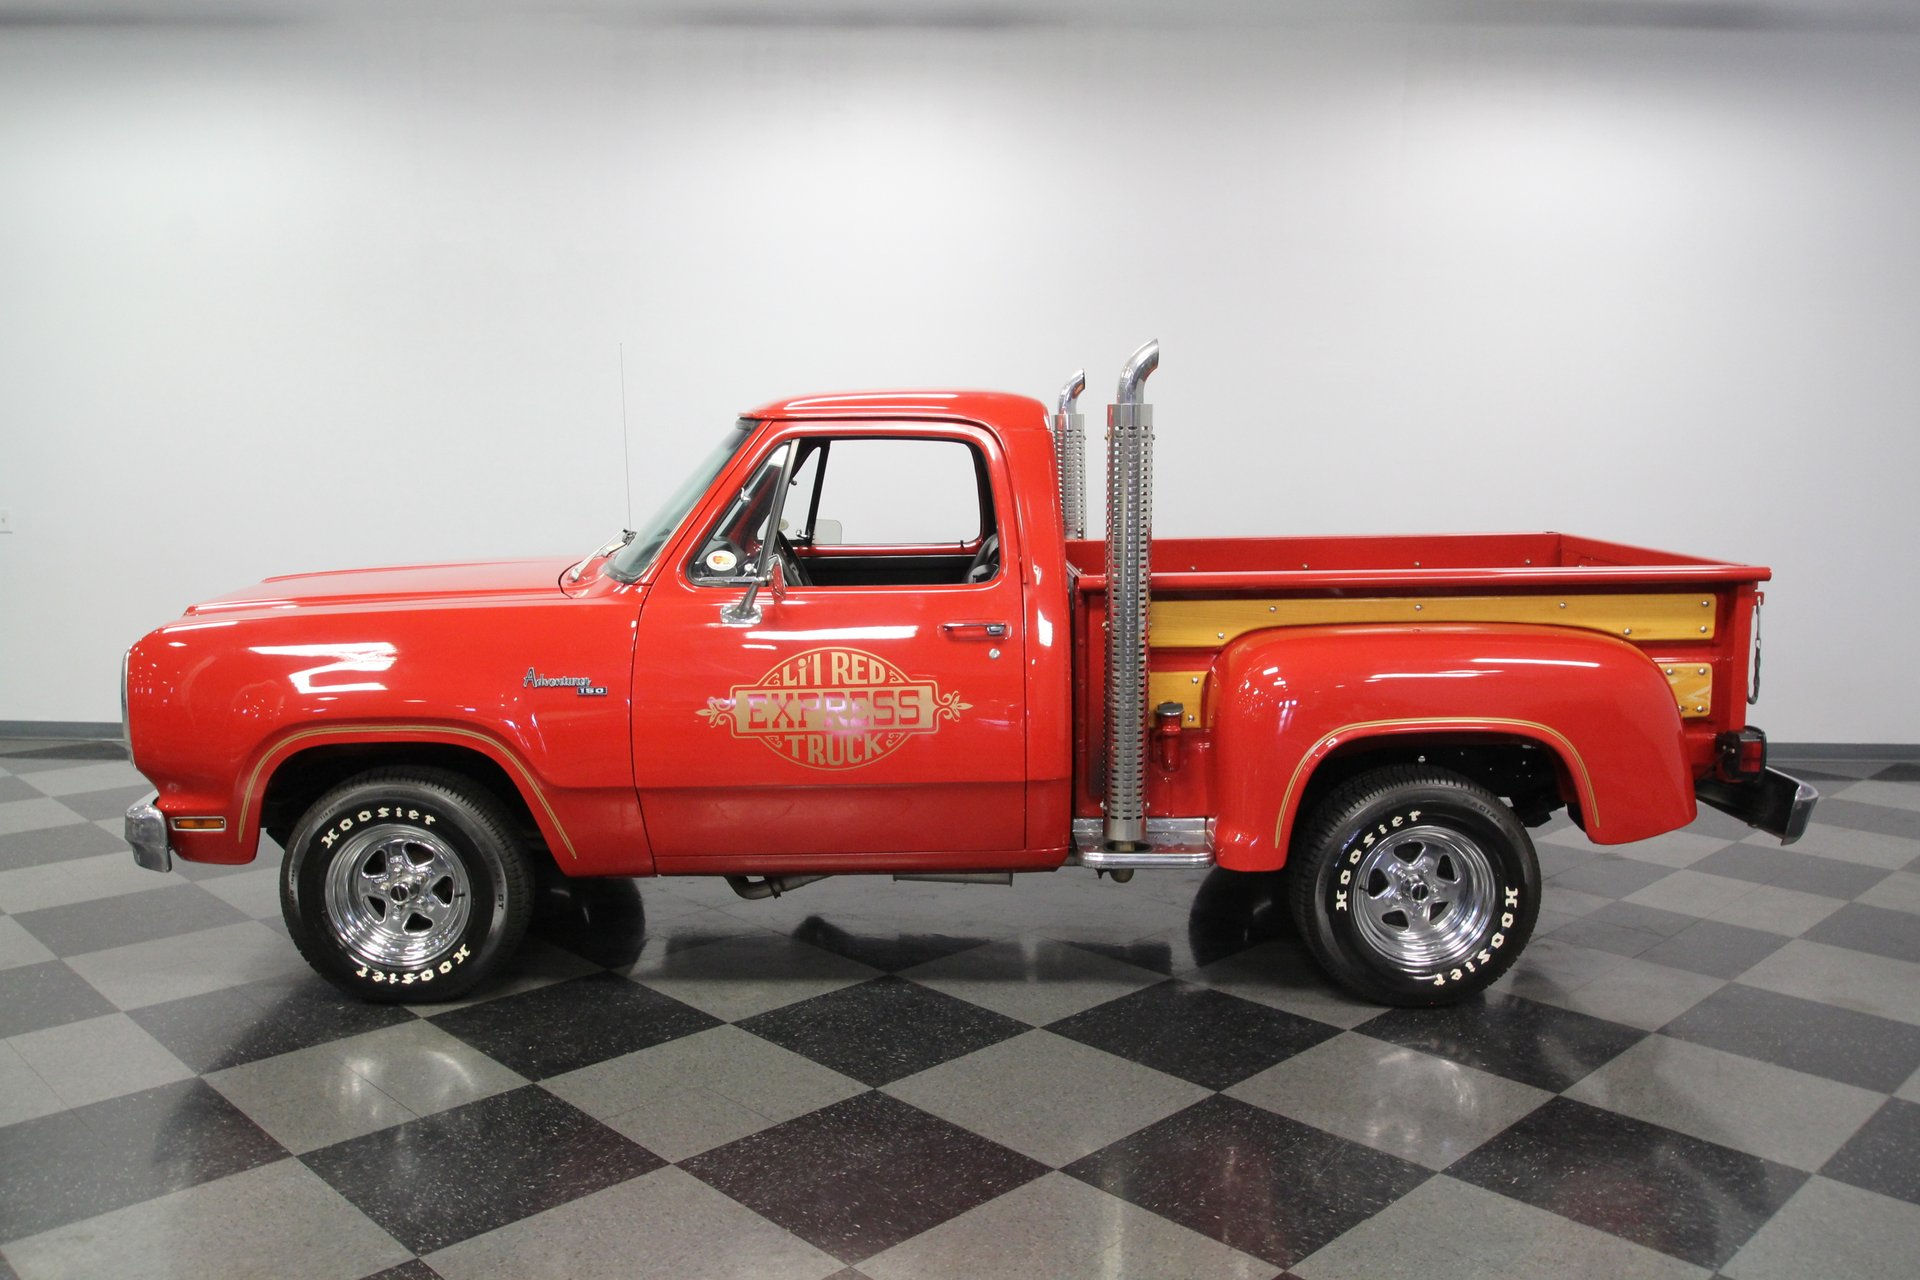 1979 dodge lil red express adventurer d10